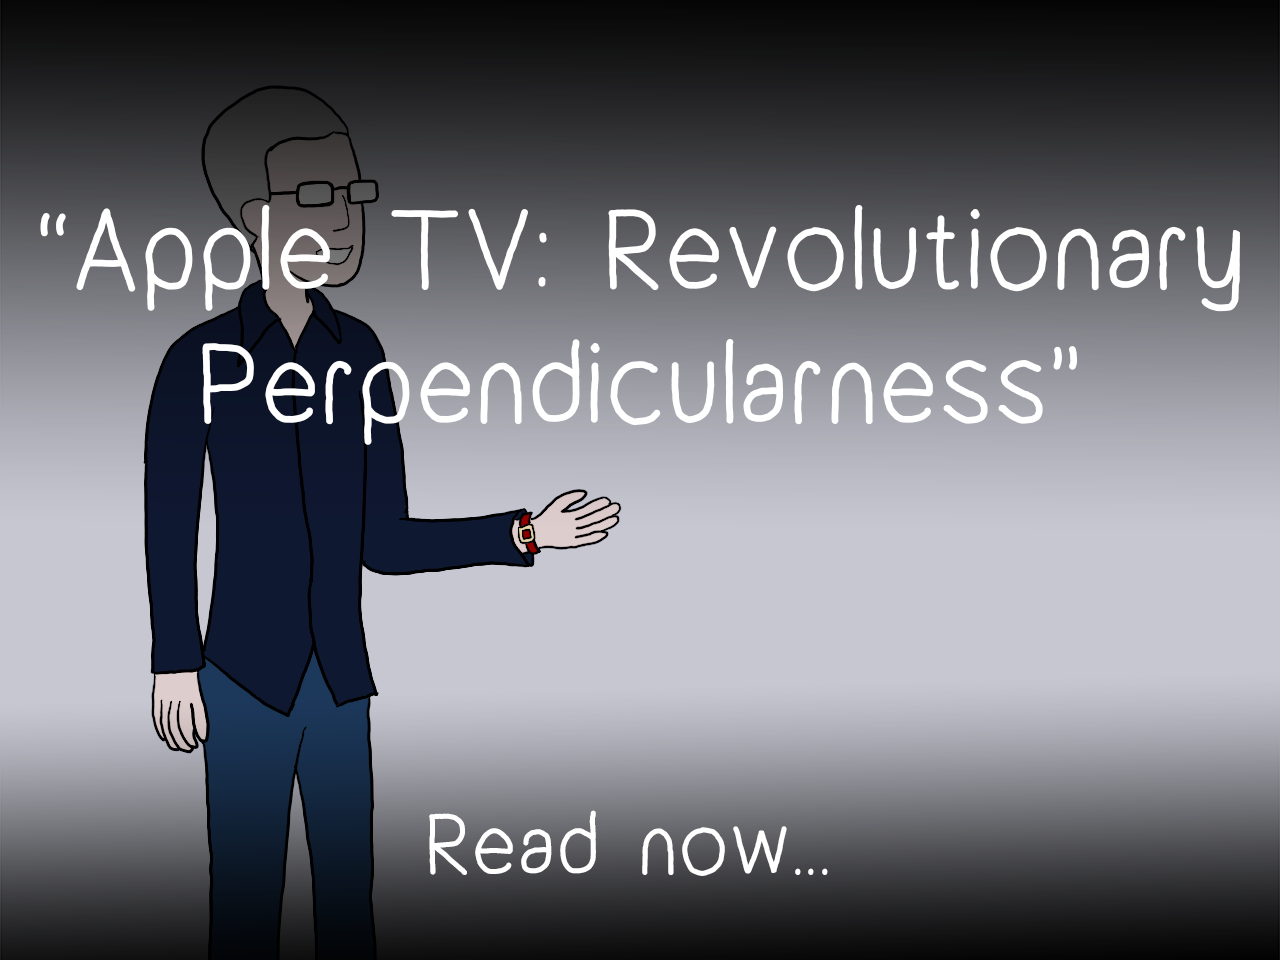 Apple TV - Revolutionary Perpendicularness